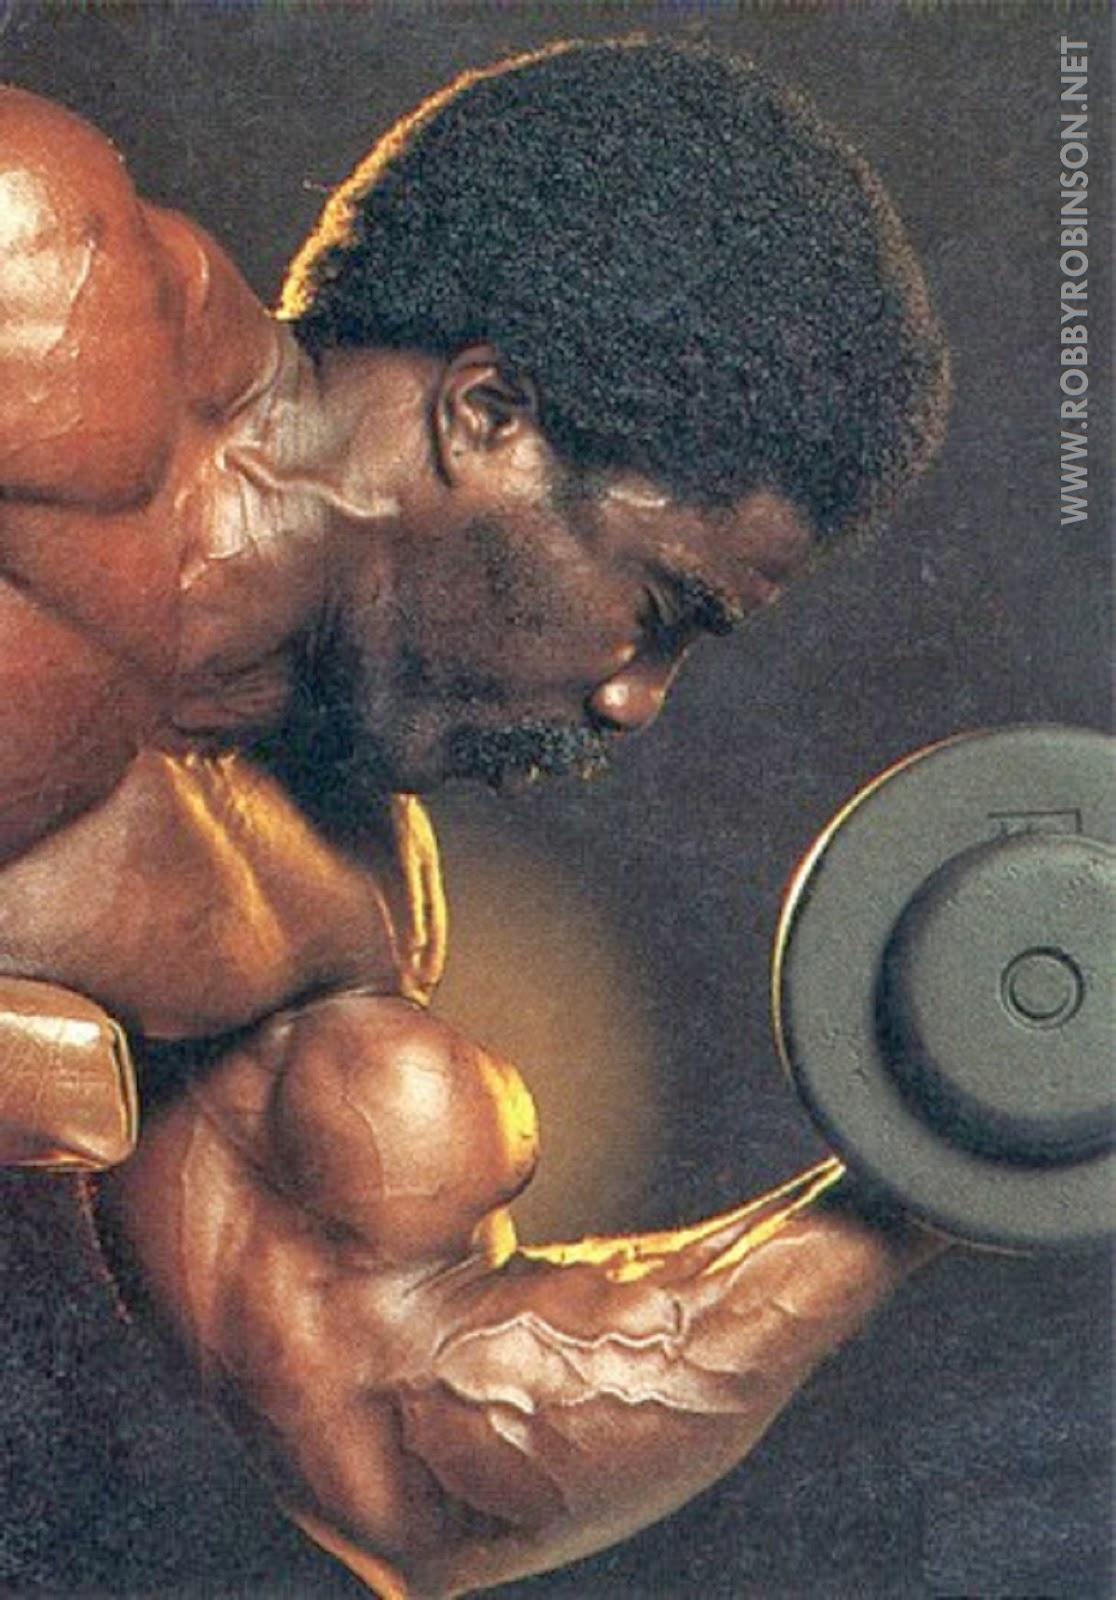 Robby Robinson - Dumbbell Biceps Curls  ● www.robbyrobinson.net/dvd_built.php ●